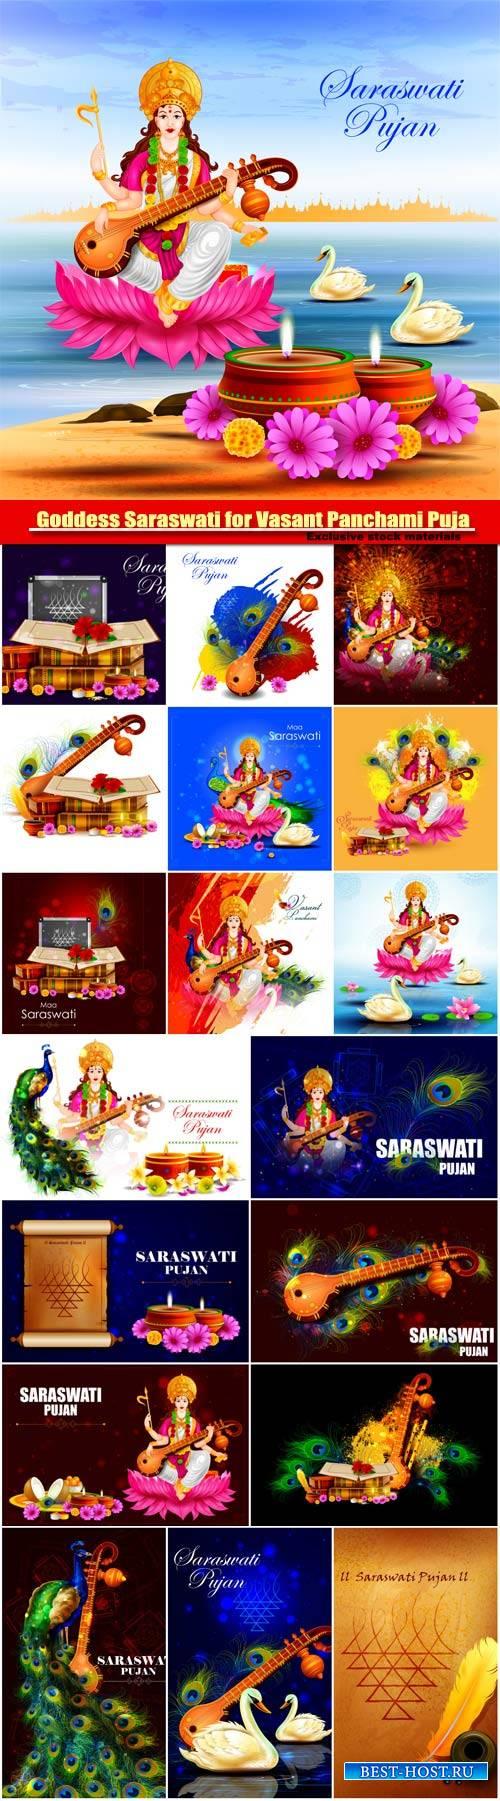 Goddess Saraswati for Vasant Panchami Puja of India, vector illustration